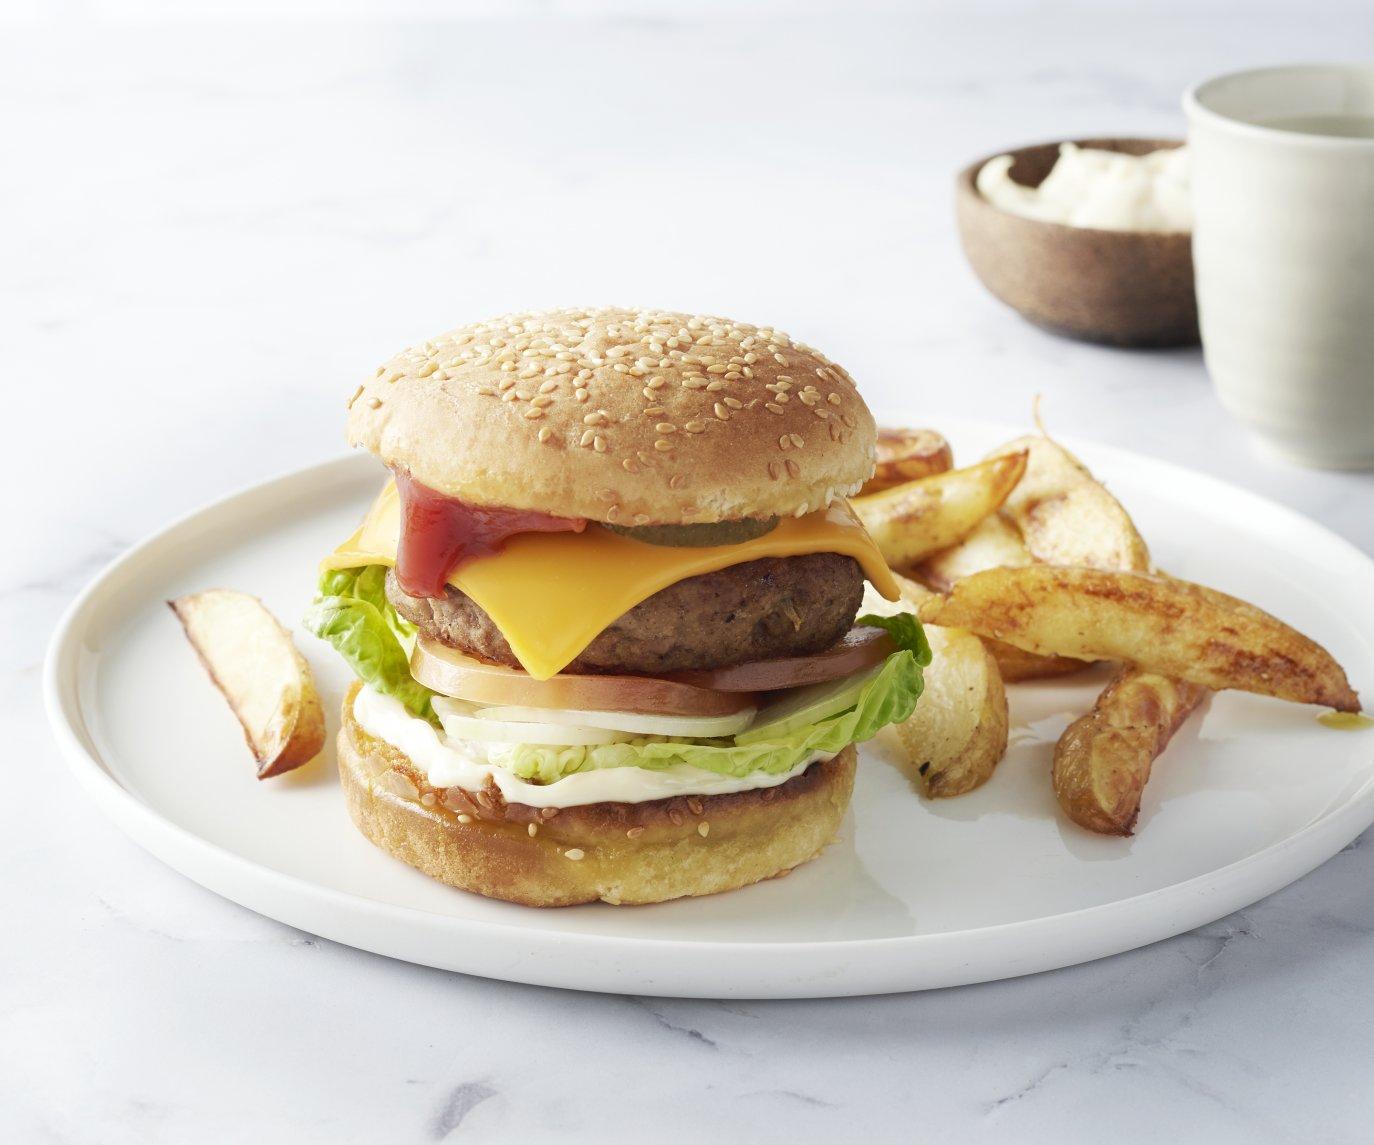 Cheeseburger met aardappelwedges